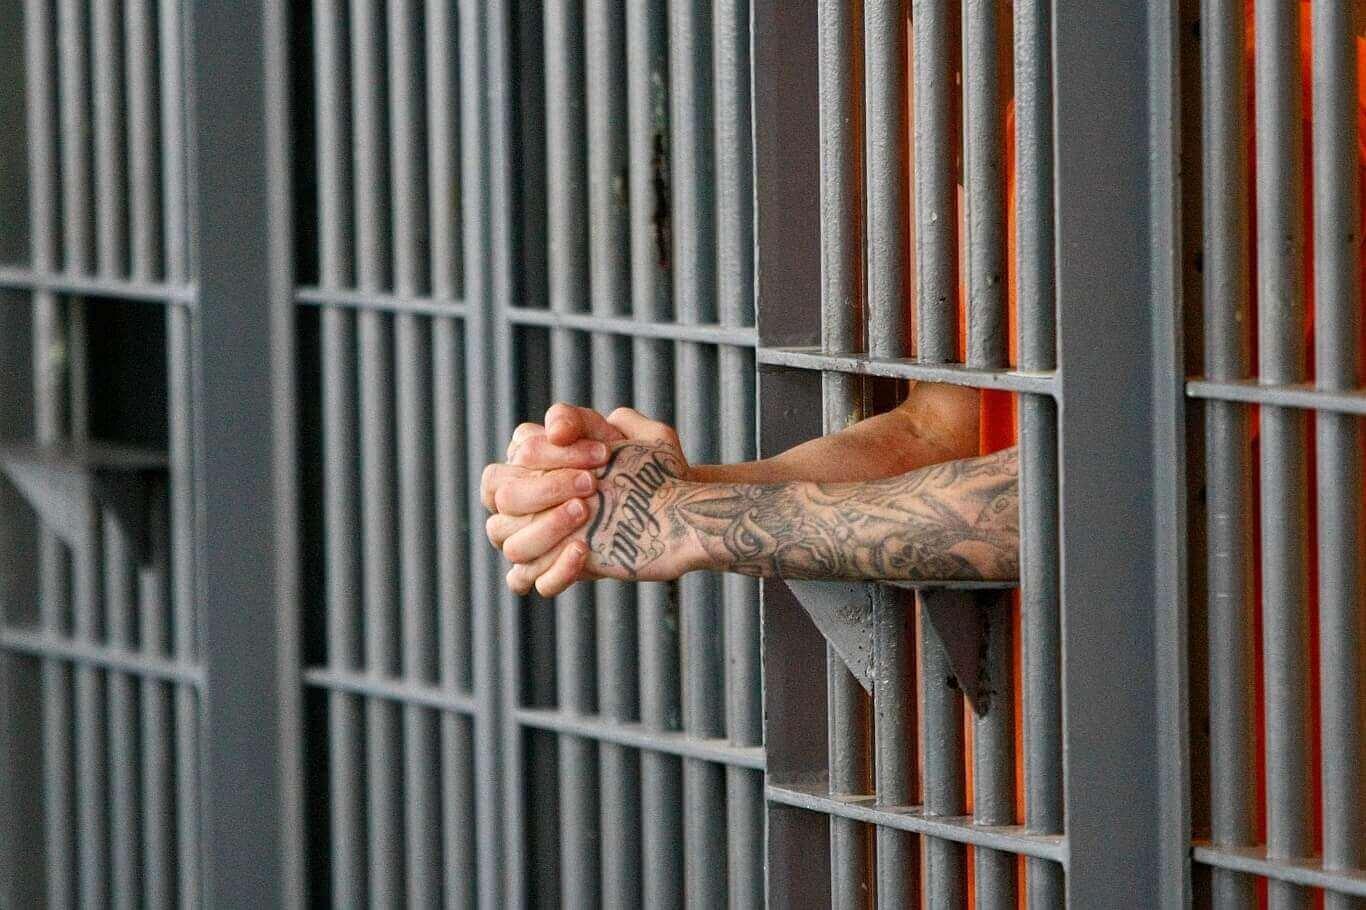 worst prison in the world